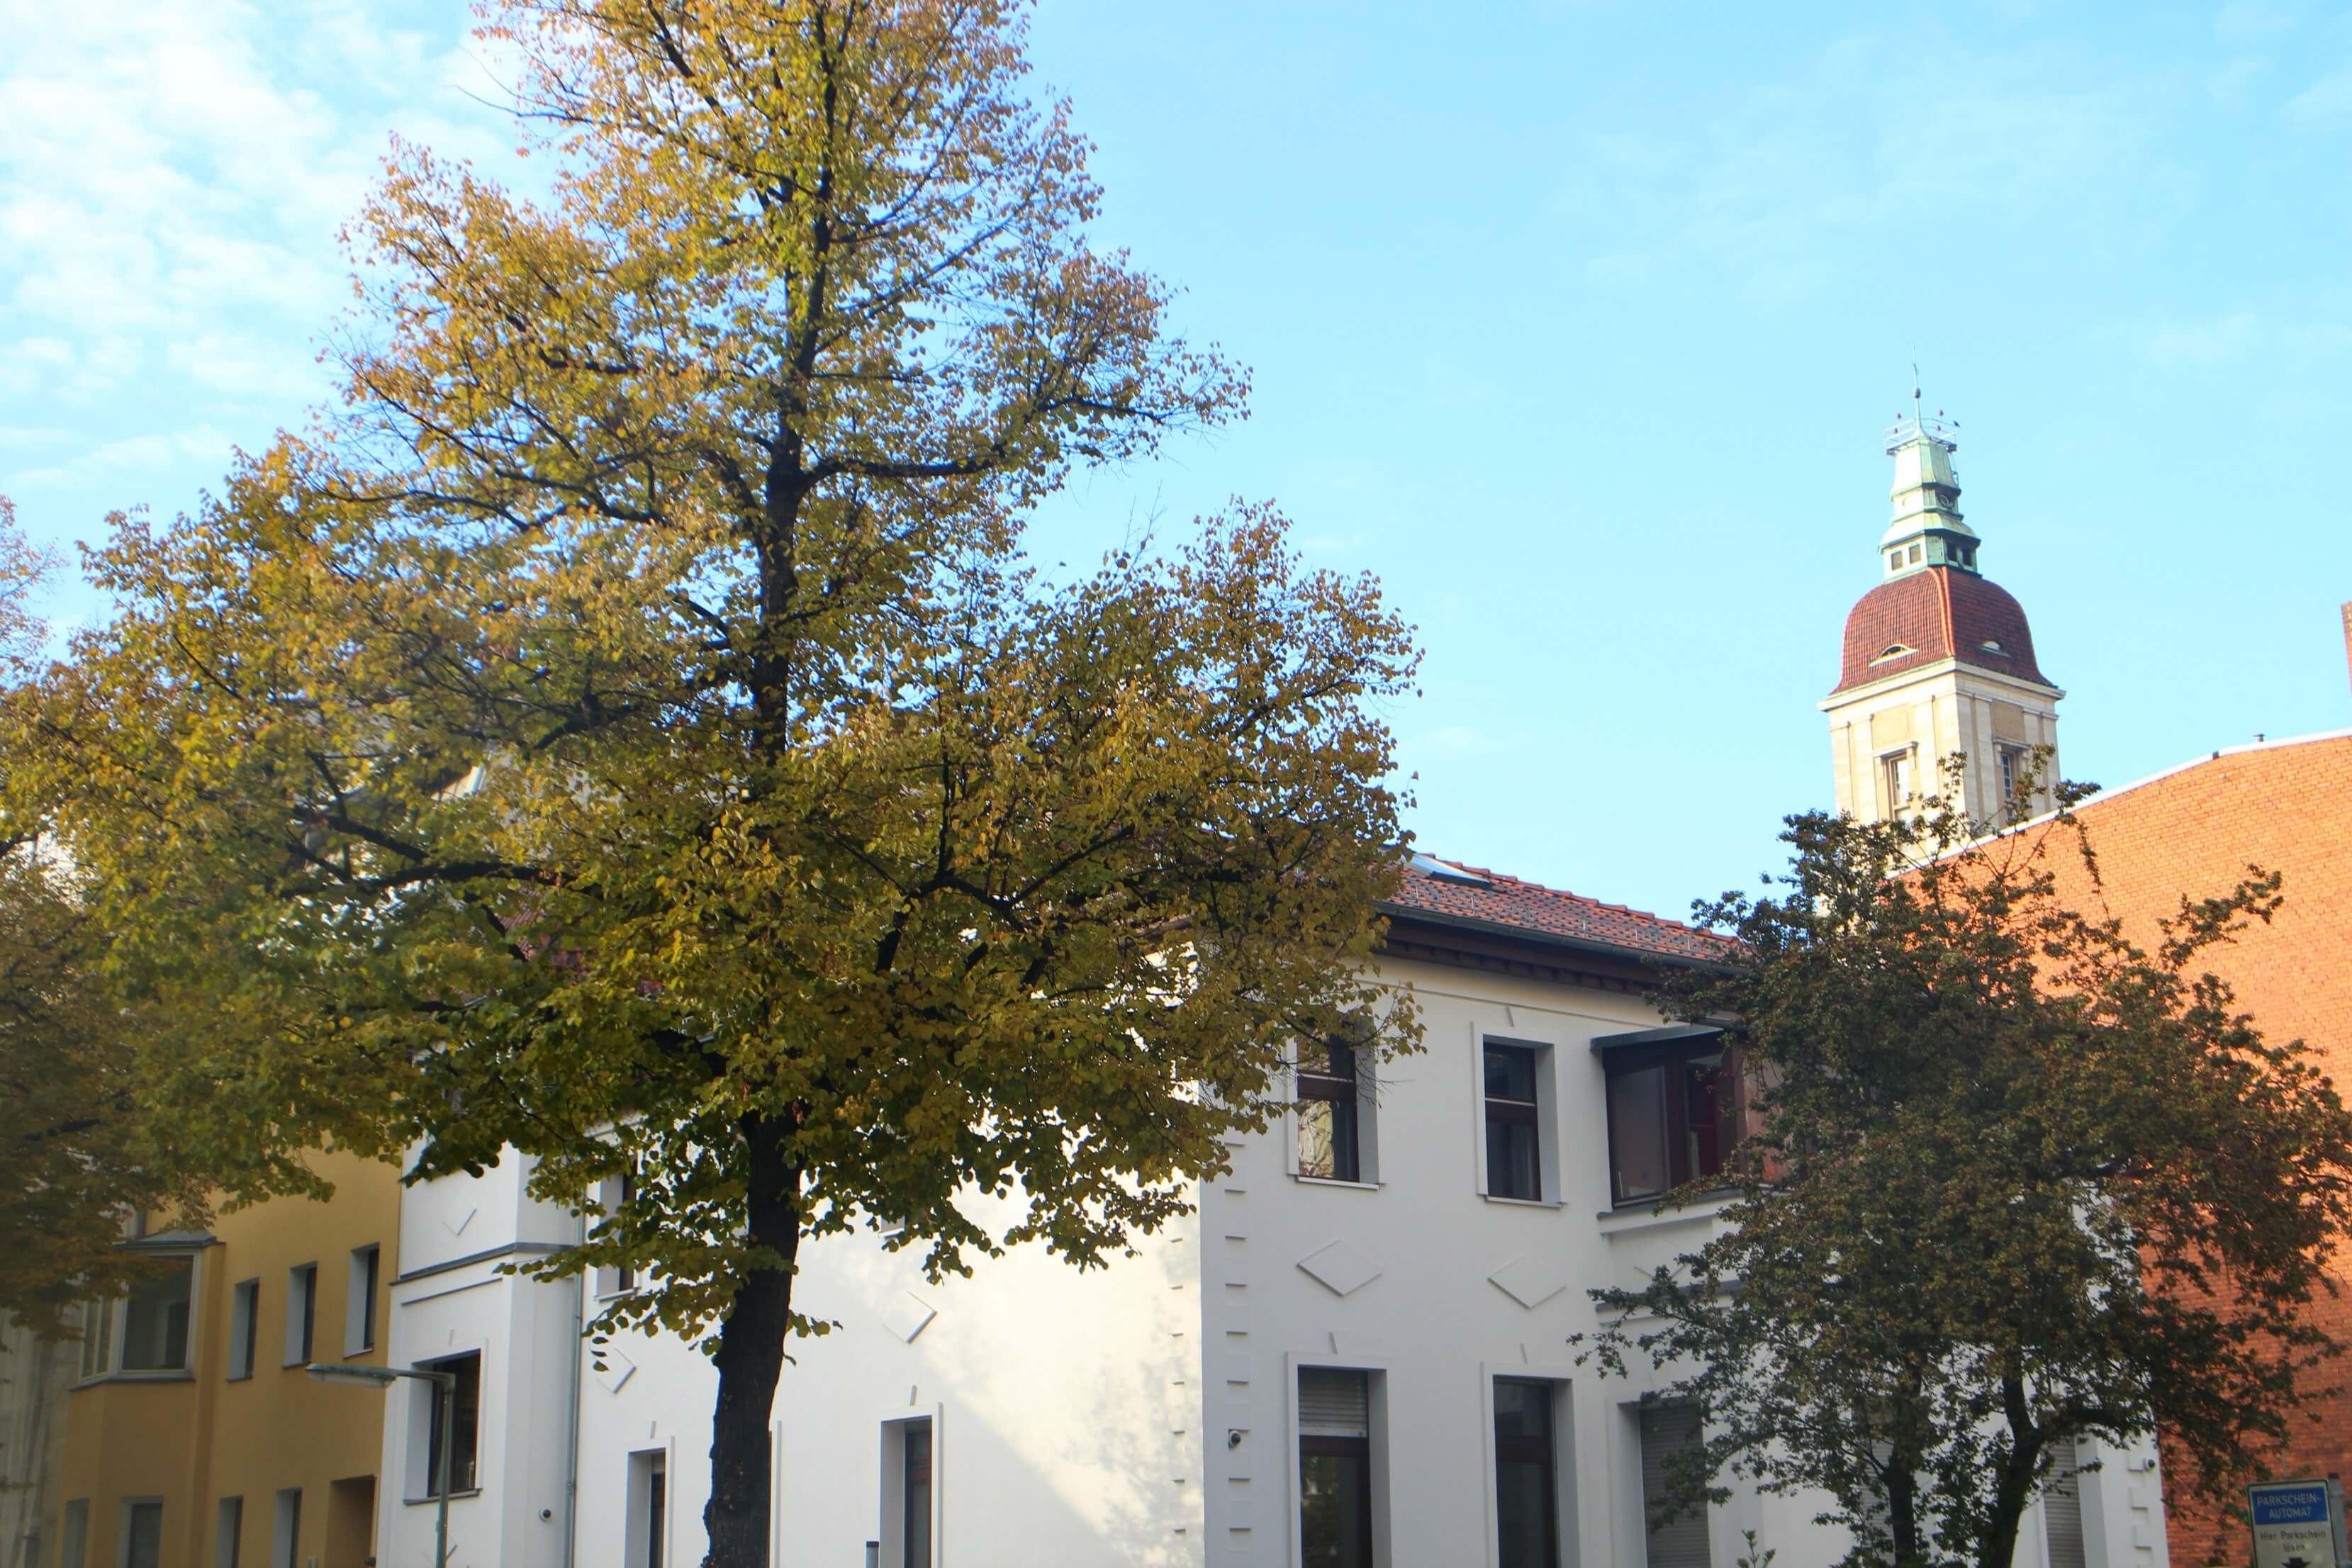 Rathaus Friedenau in de herfst